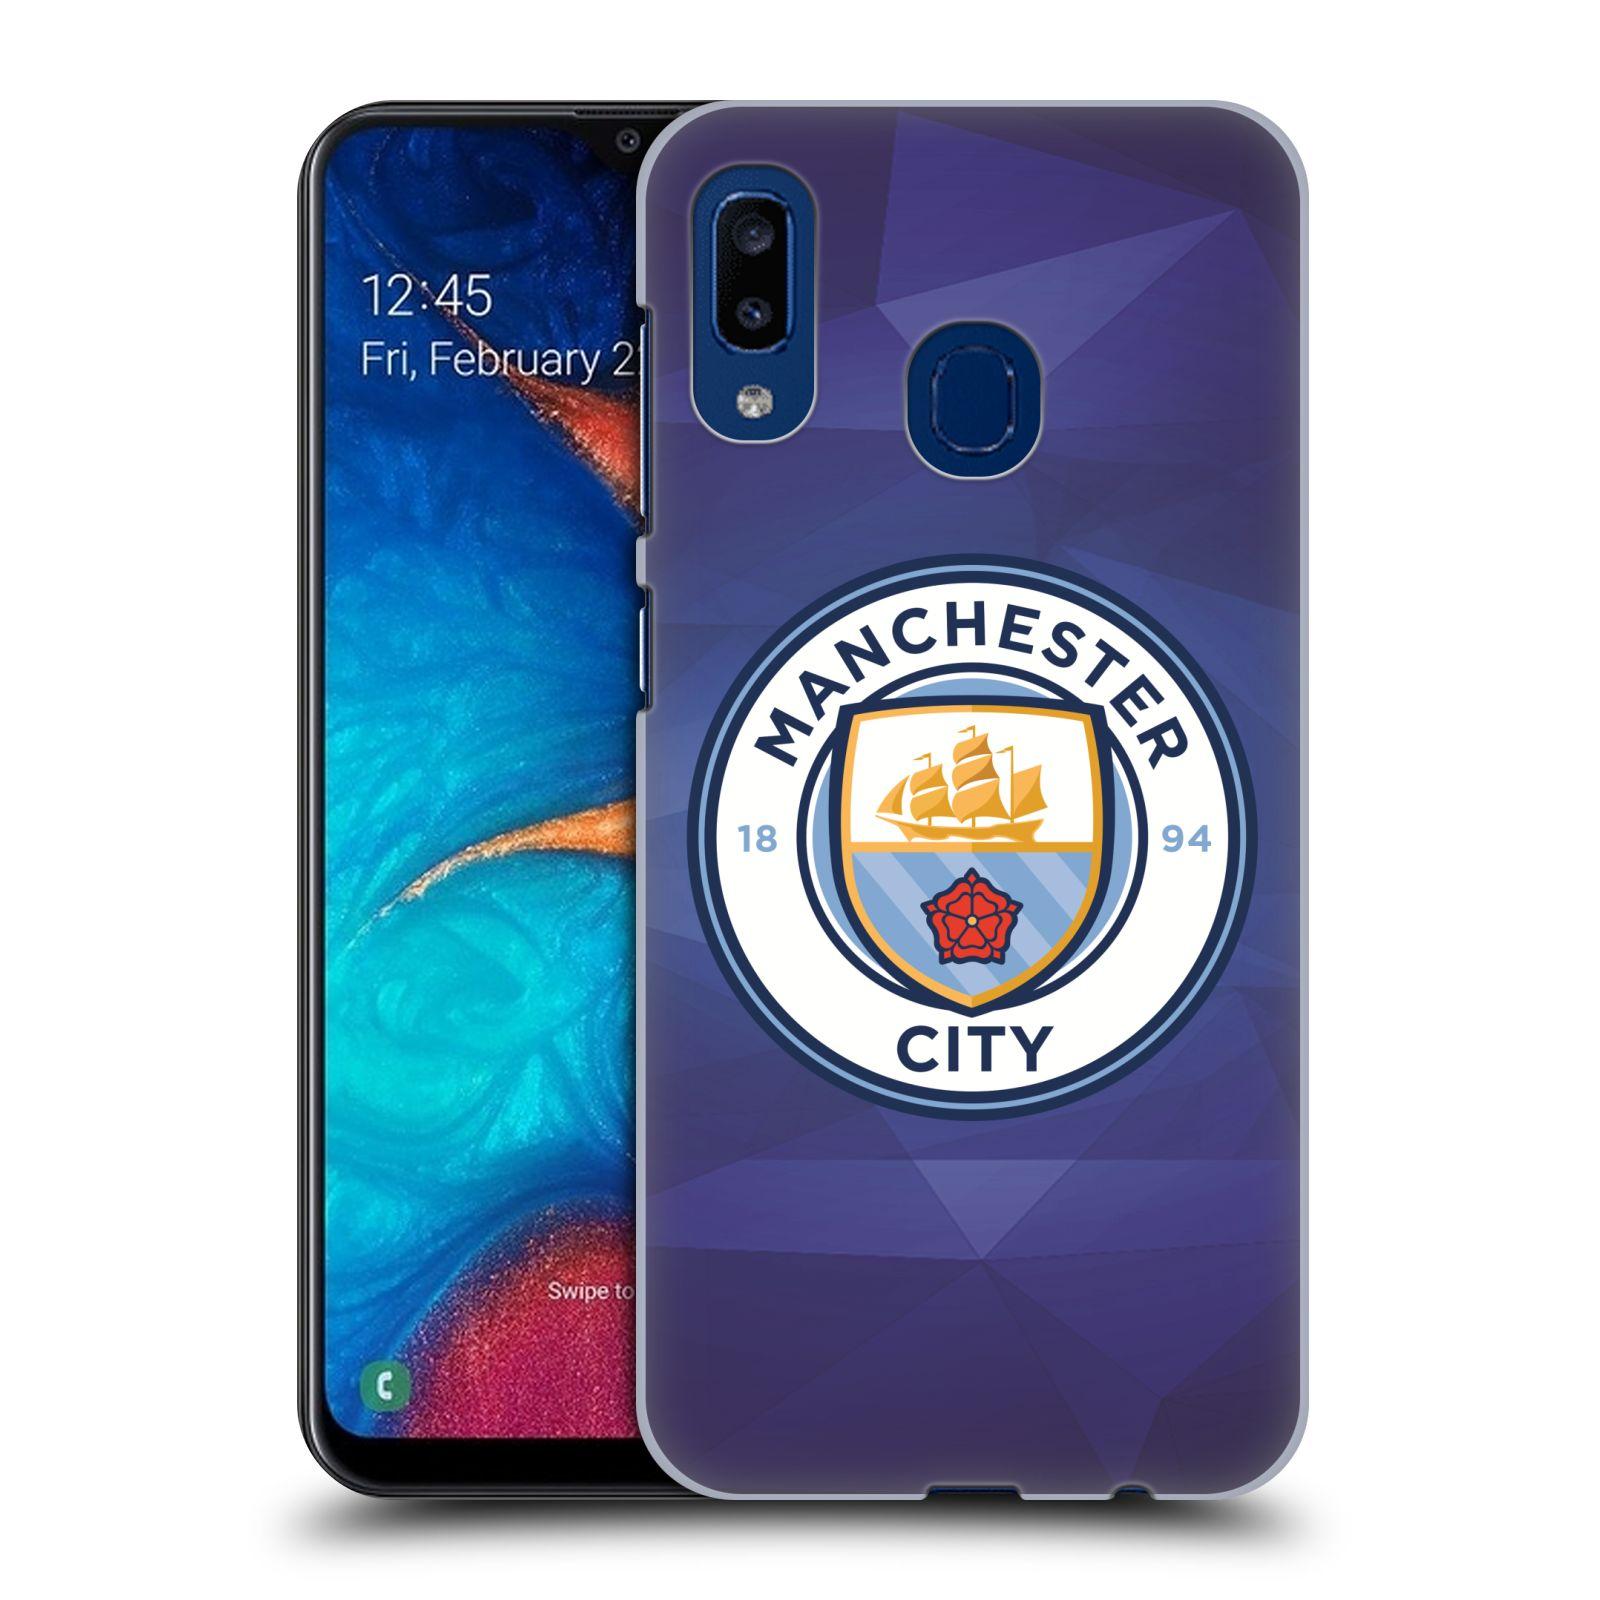 Plastové pouzdro na mobil Samsung Galaxy A20 - Head Case - Manchester City FC - Modré nové logo